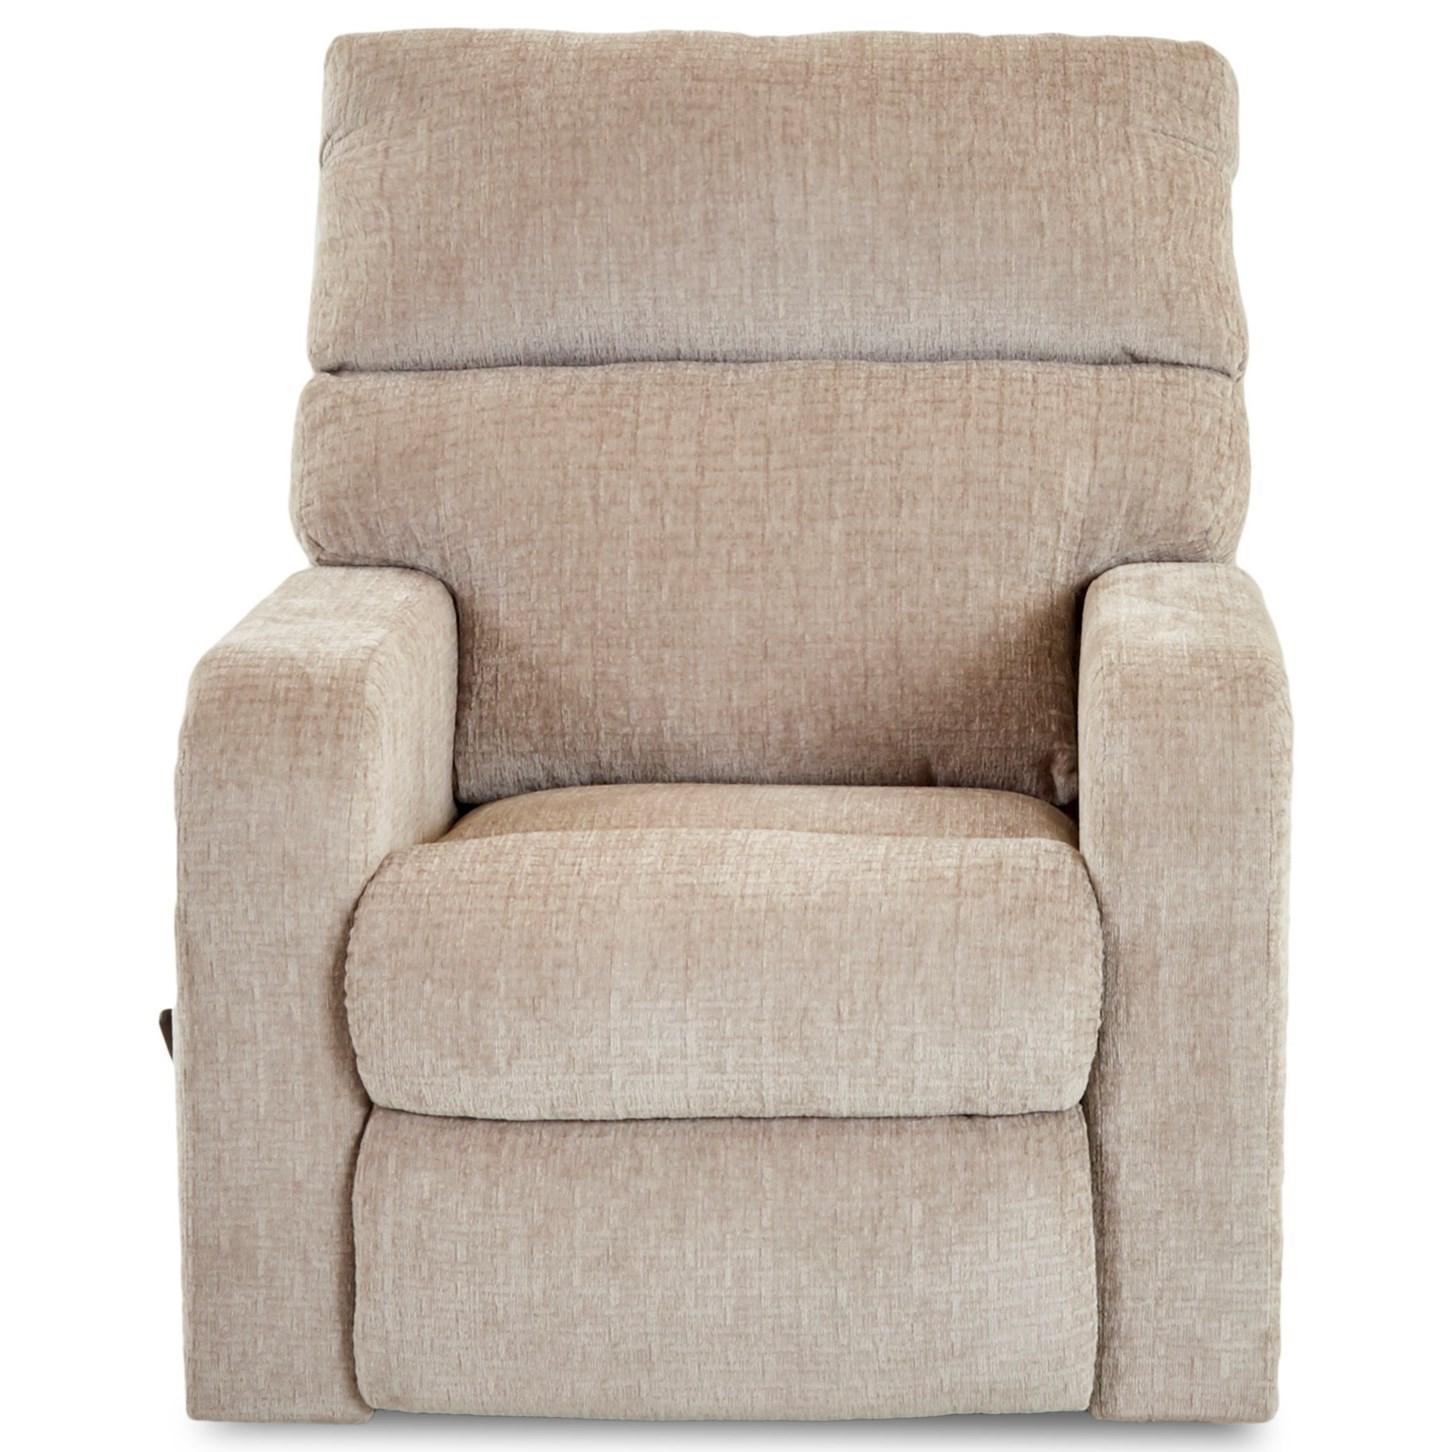 Casual Reclining Chair